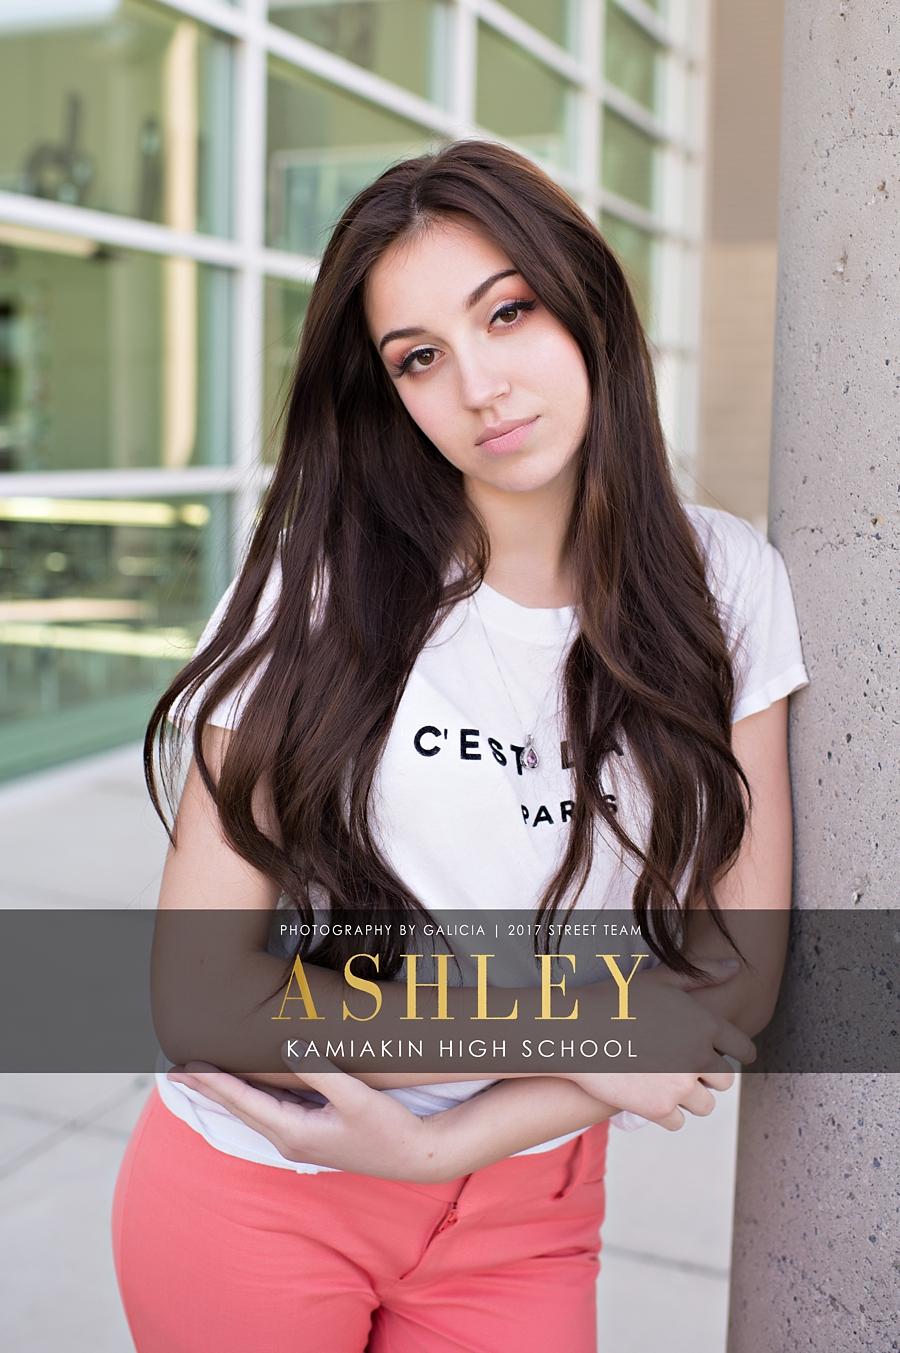 AshleyC.jpg